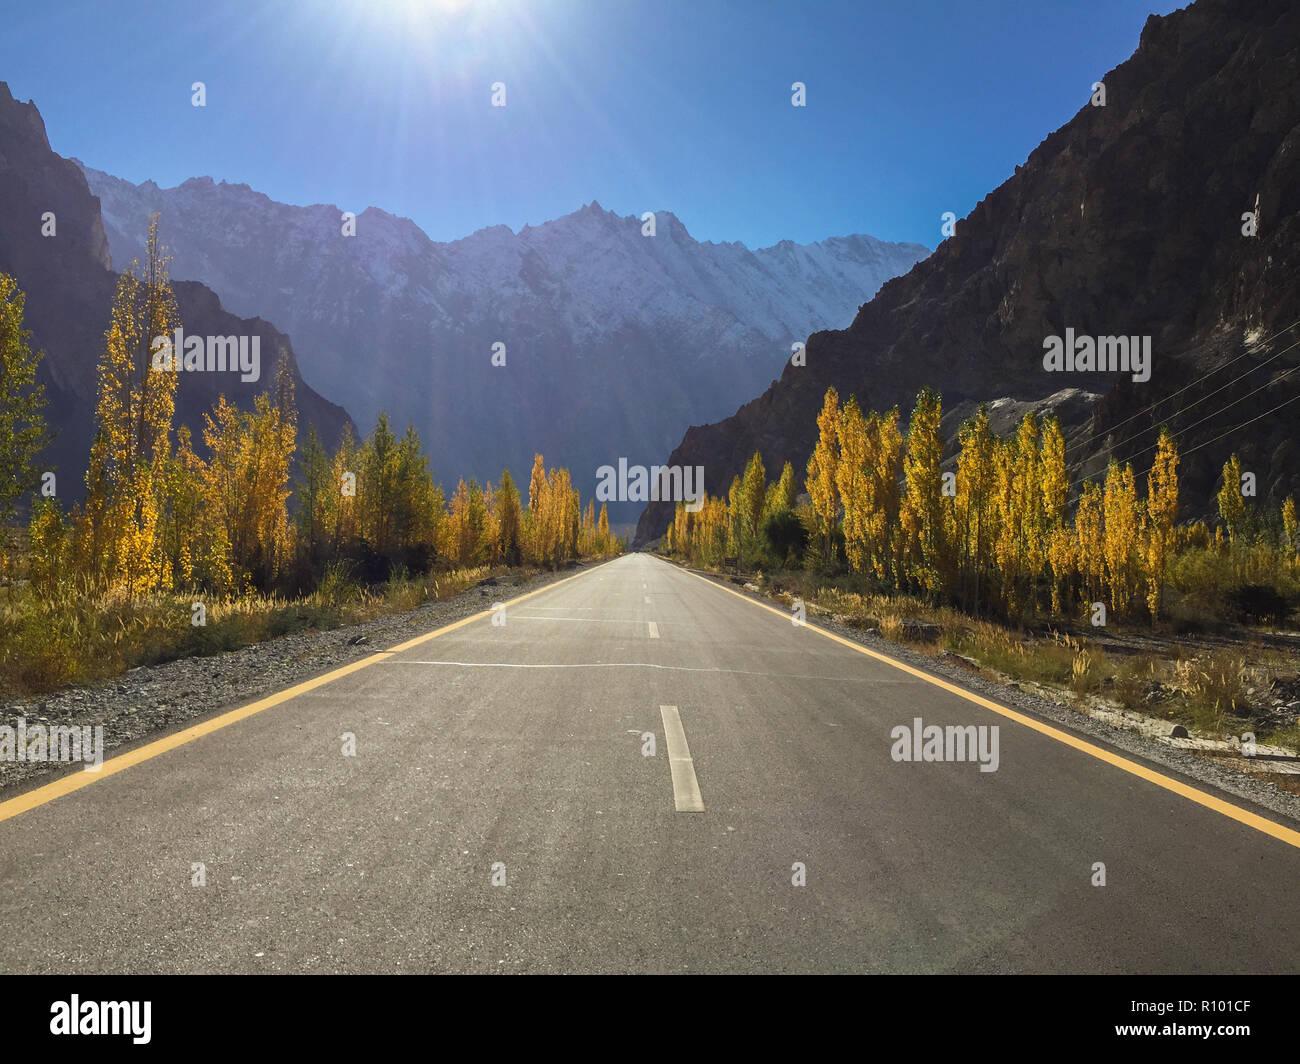 Sunrise with clear blue sky over Karakoram highway. Poplar trees get brilliant golden leaves. Passu, Pakistan. - Stock Image